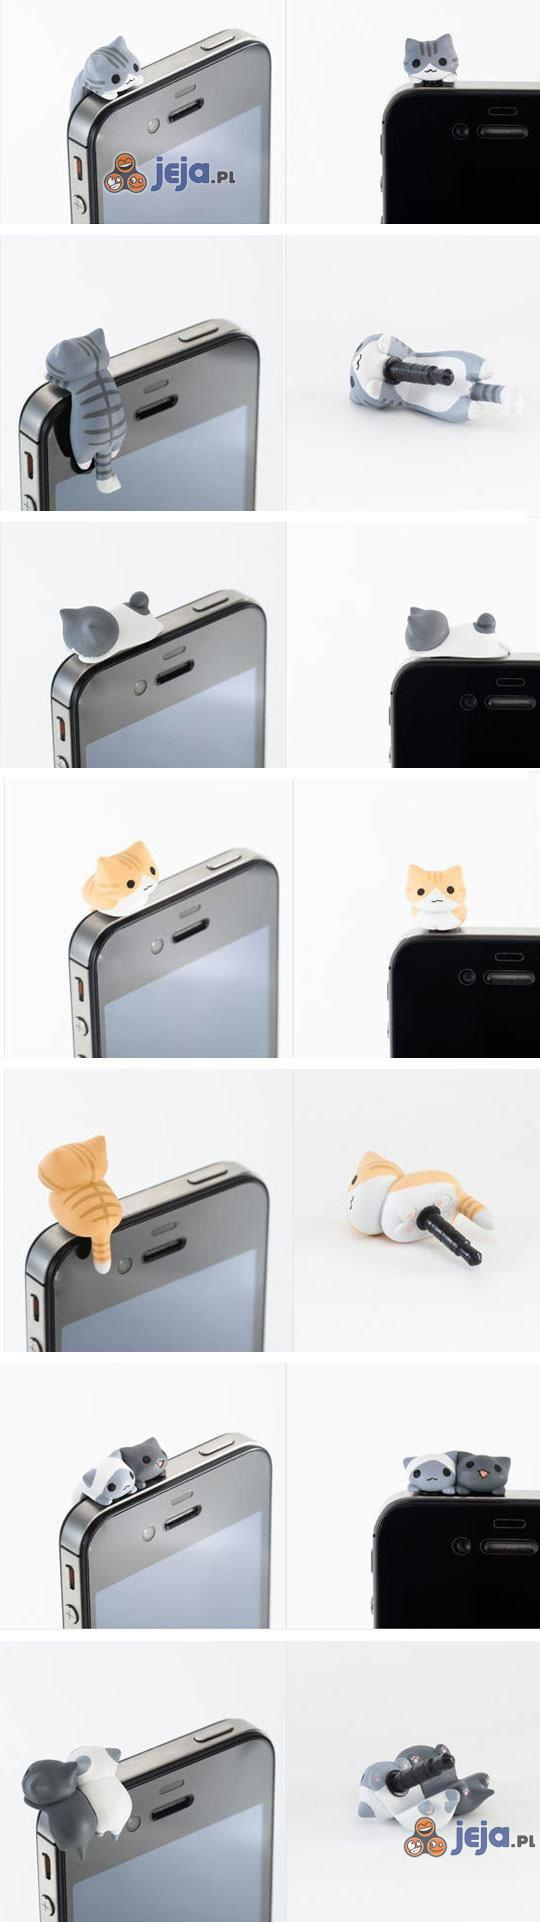 Koty do telefonu